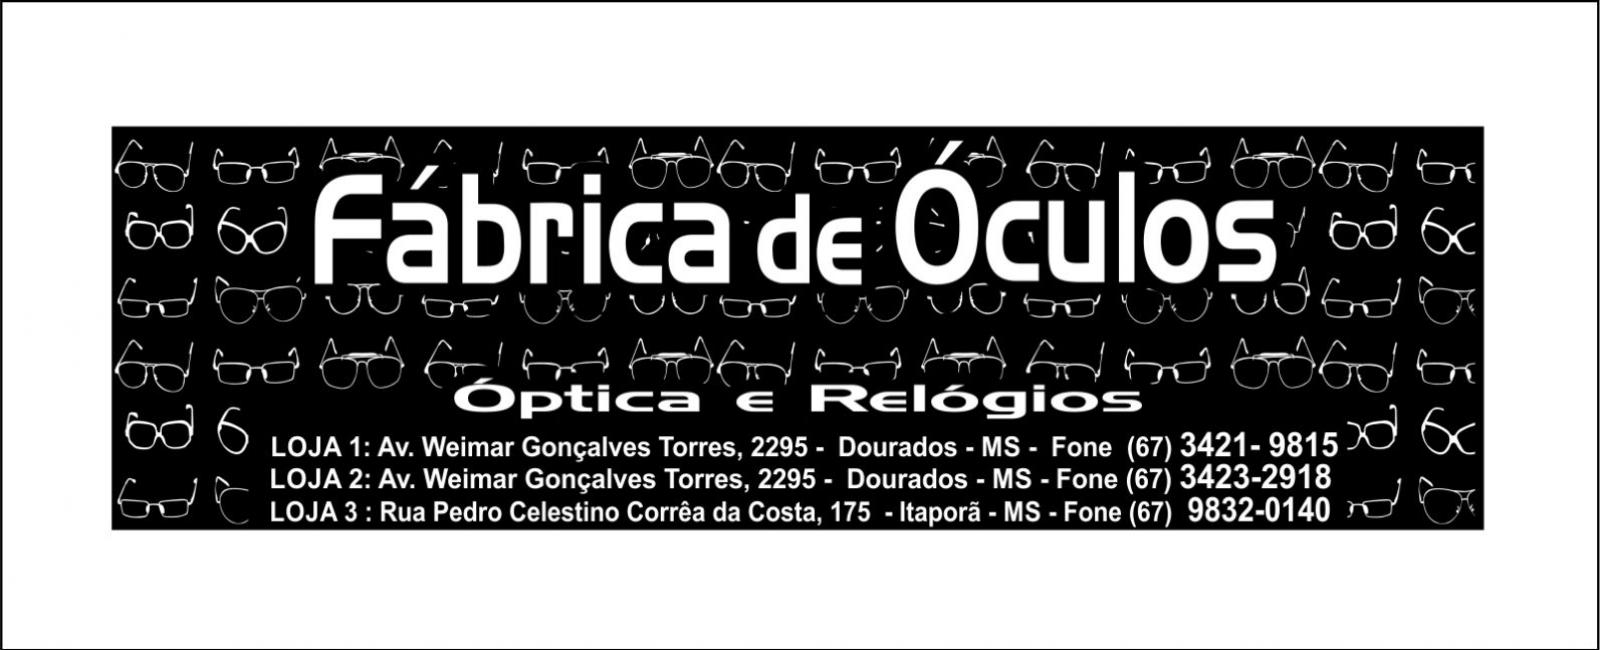 FABRICA DE OCULOS